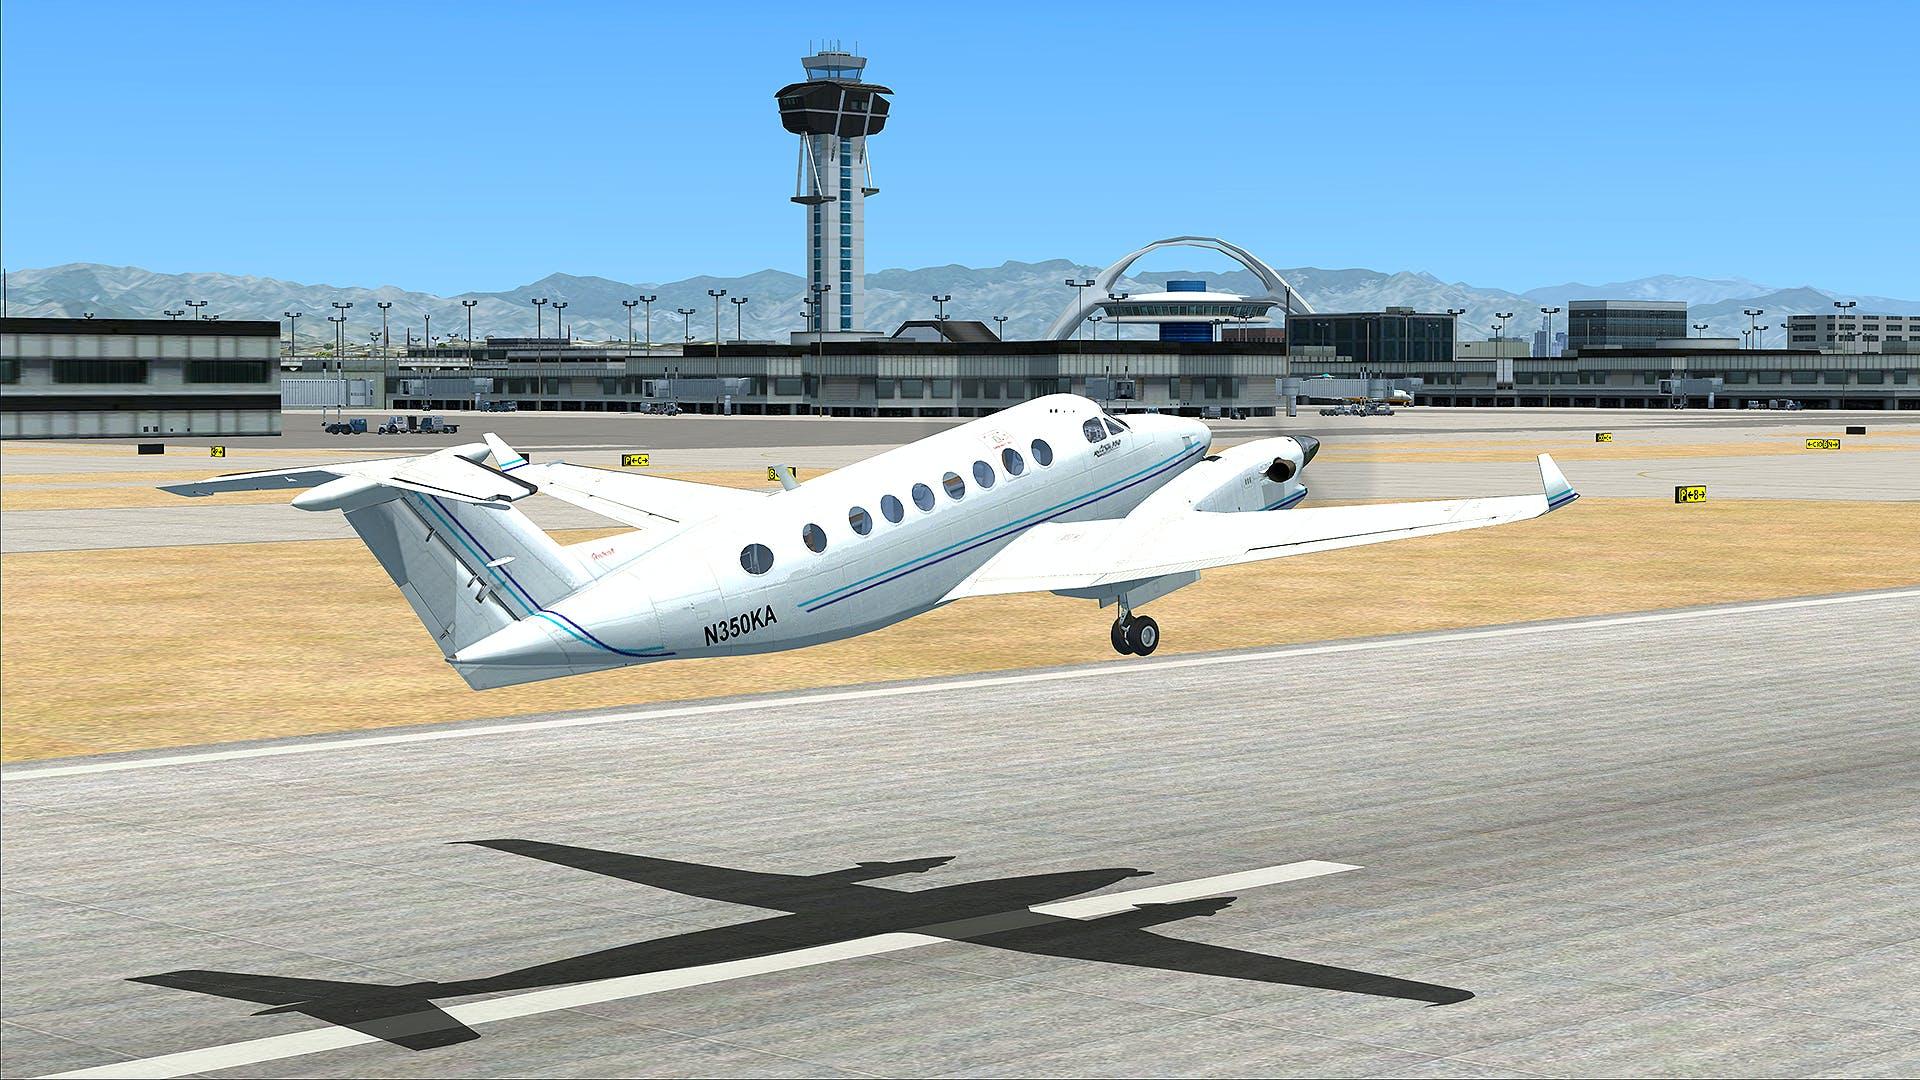 Flight simulator take off